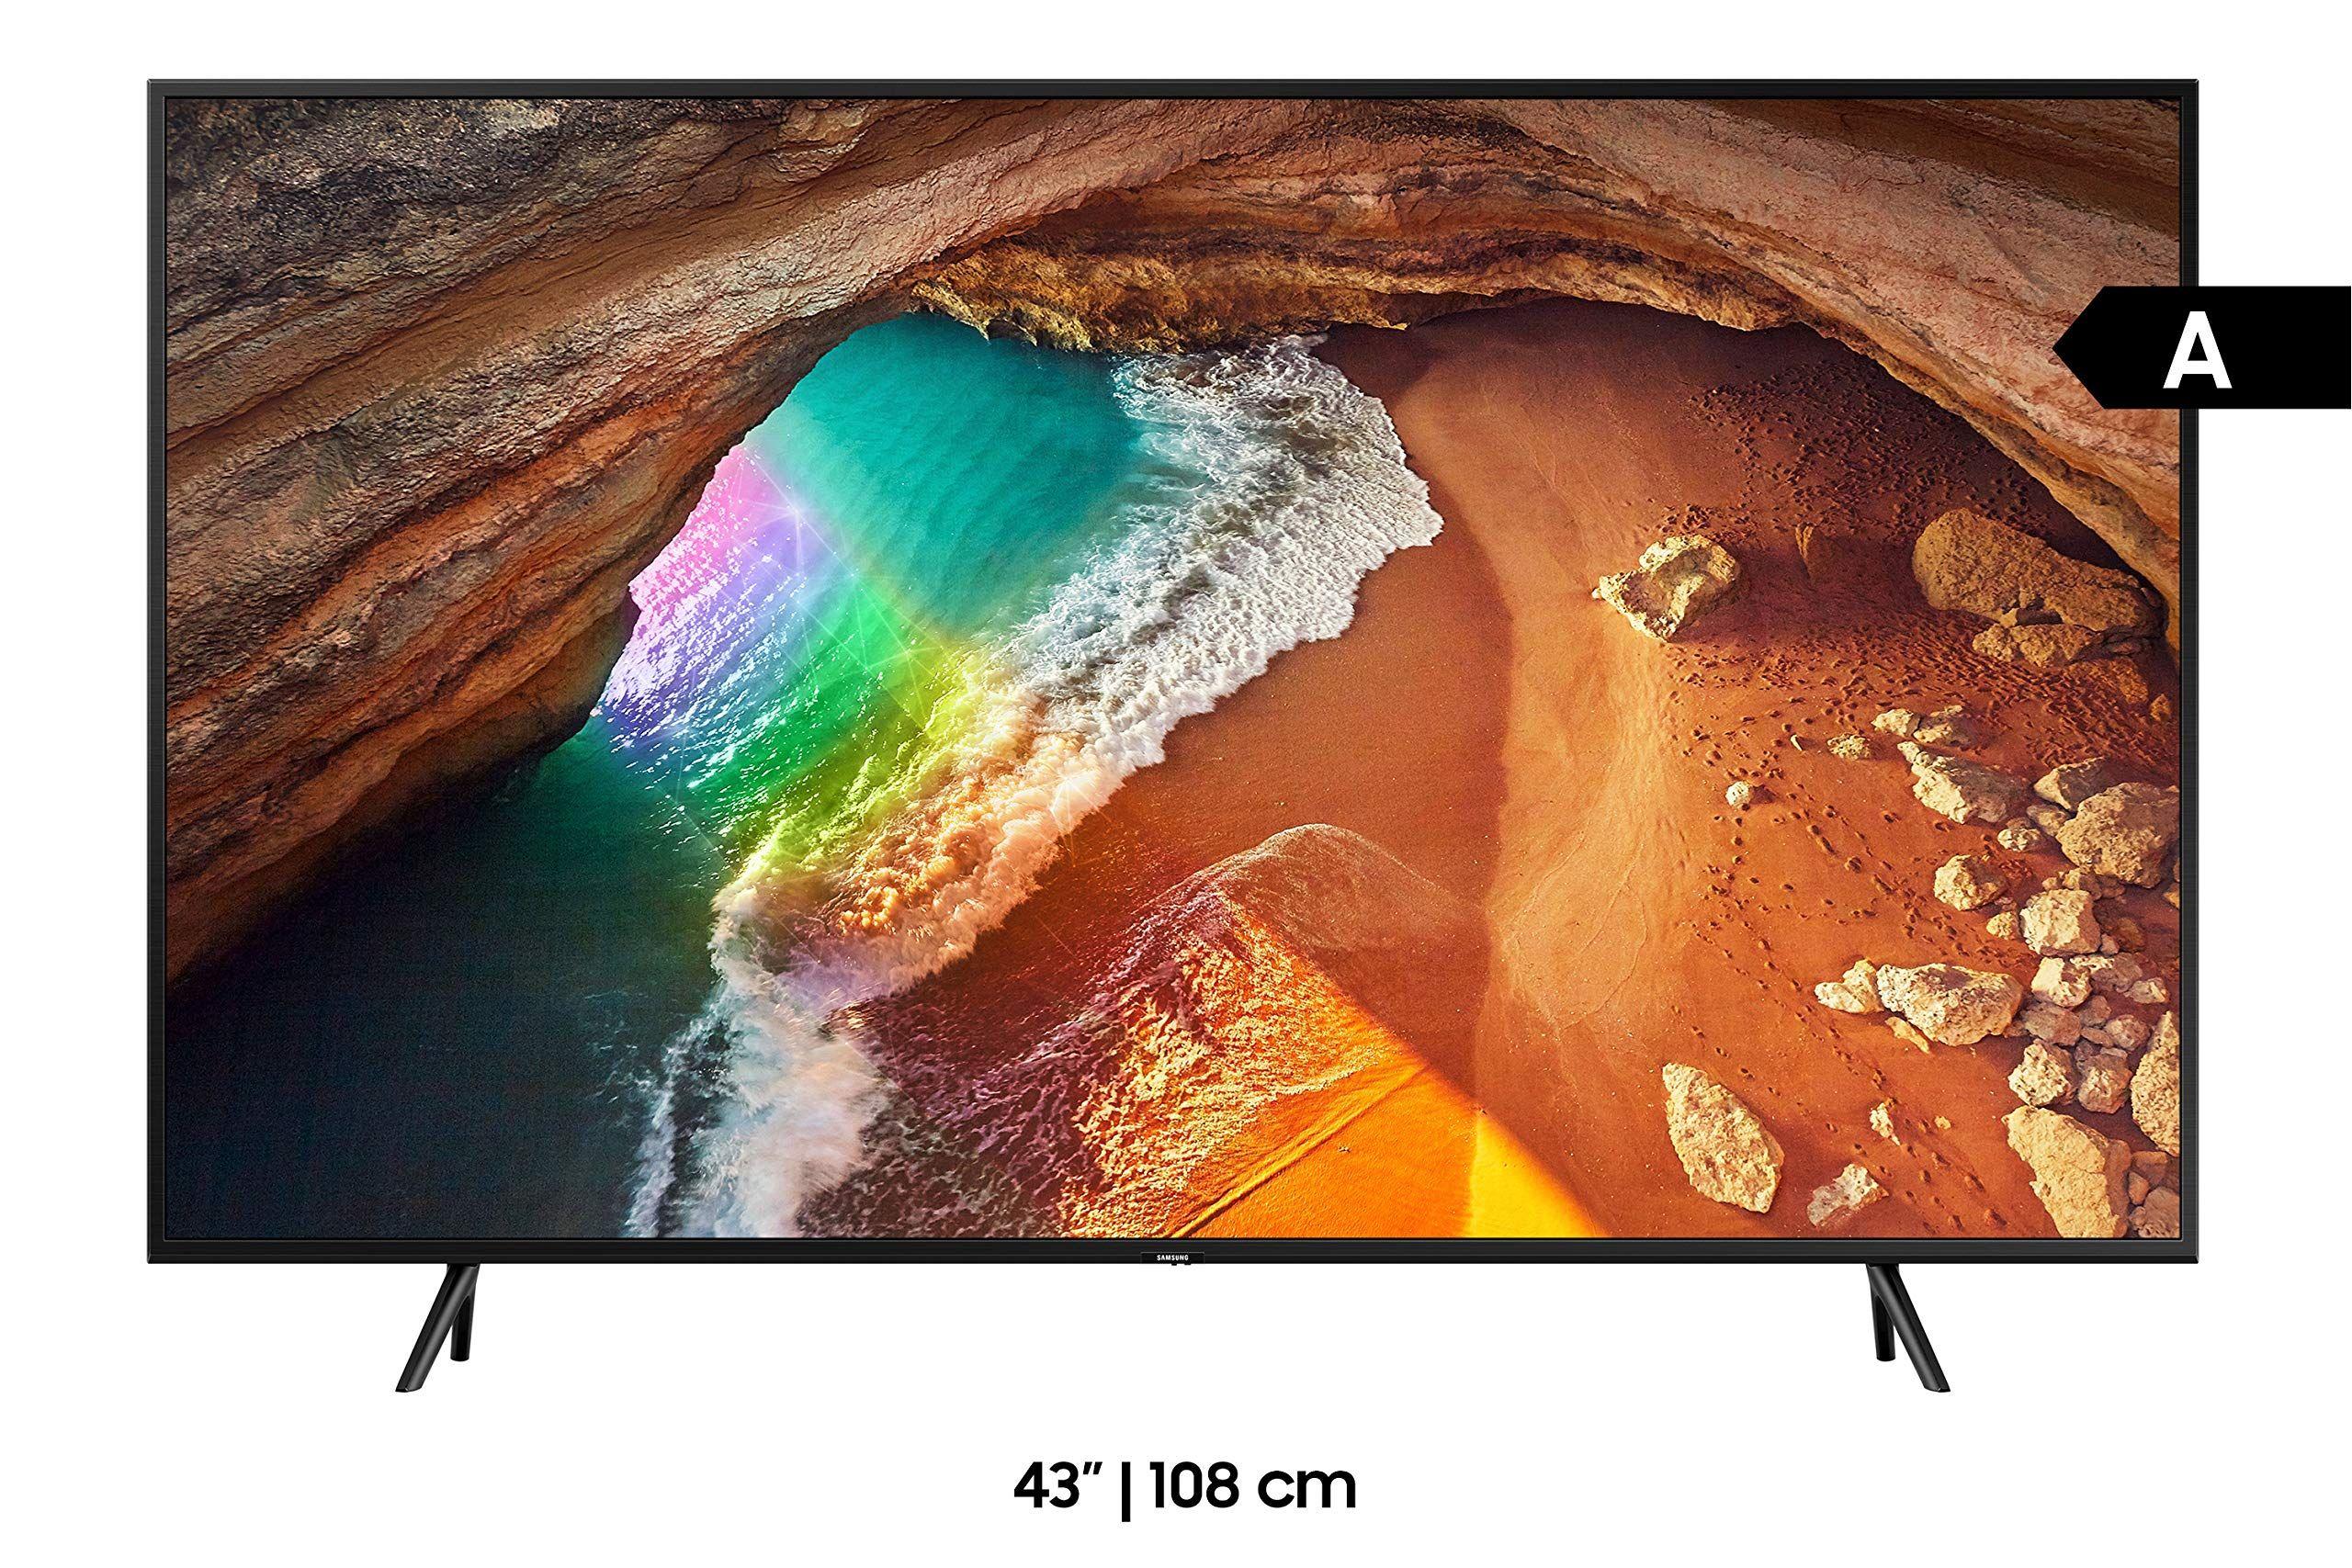 Samsung Q60r 108 Cm 43 Zoll 4k Qled Fernseher Q Hdr Ultra Hd Hdr Twin Tuner Smart Tv Modelljahr 2019 In 2020 Fernseher Smart Tv Samsung Standherd